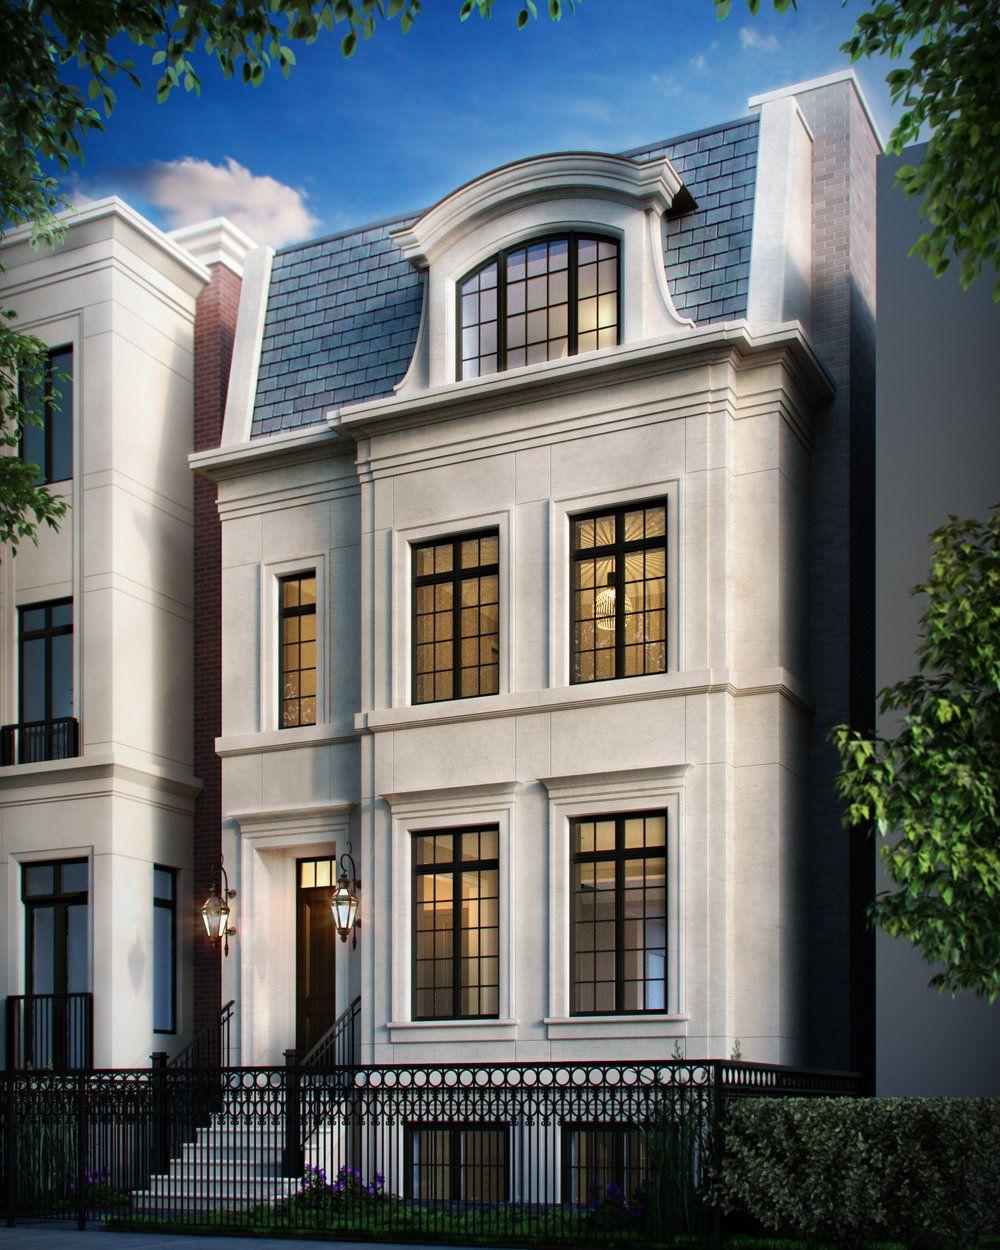 3938 Greenview Front Facade Rendering For Appraisal 1 23 18 Jpg Facade House House Exterior Modern Townhouse